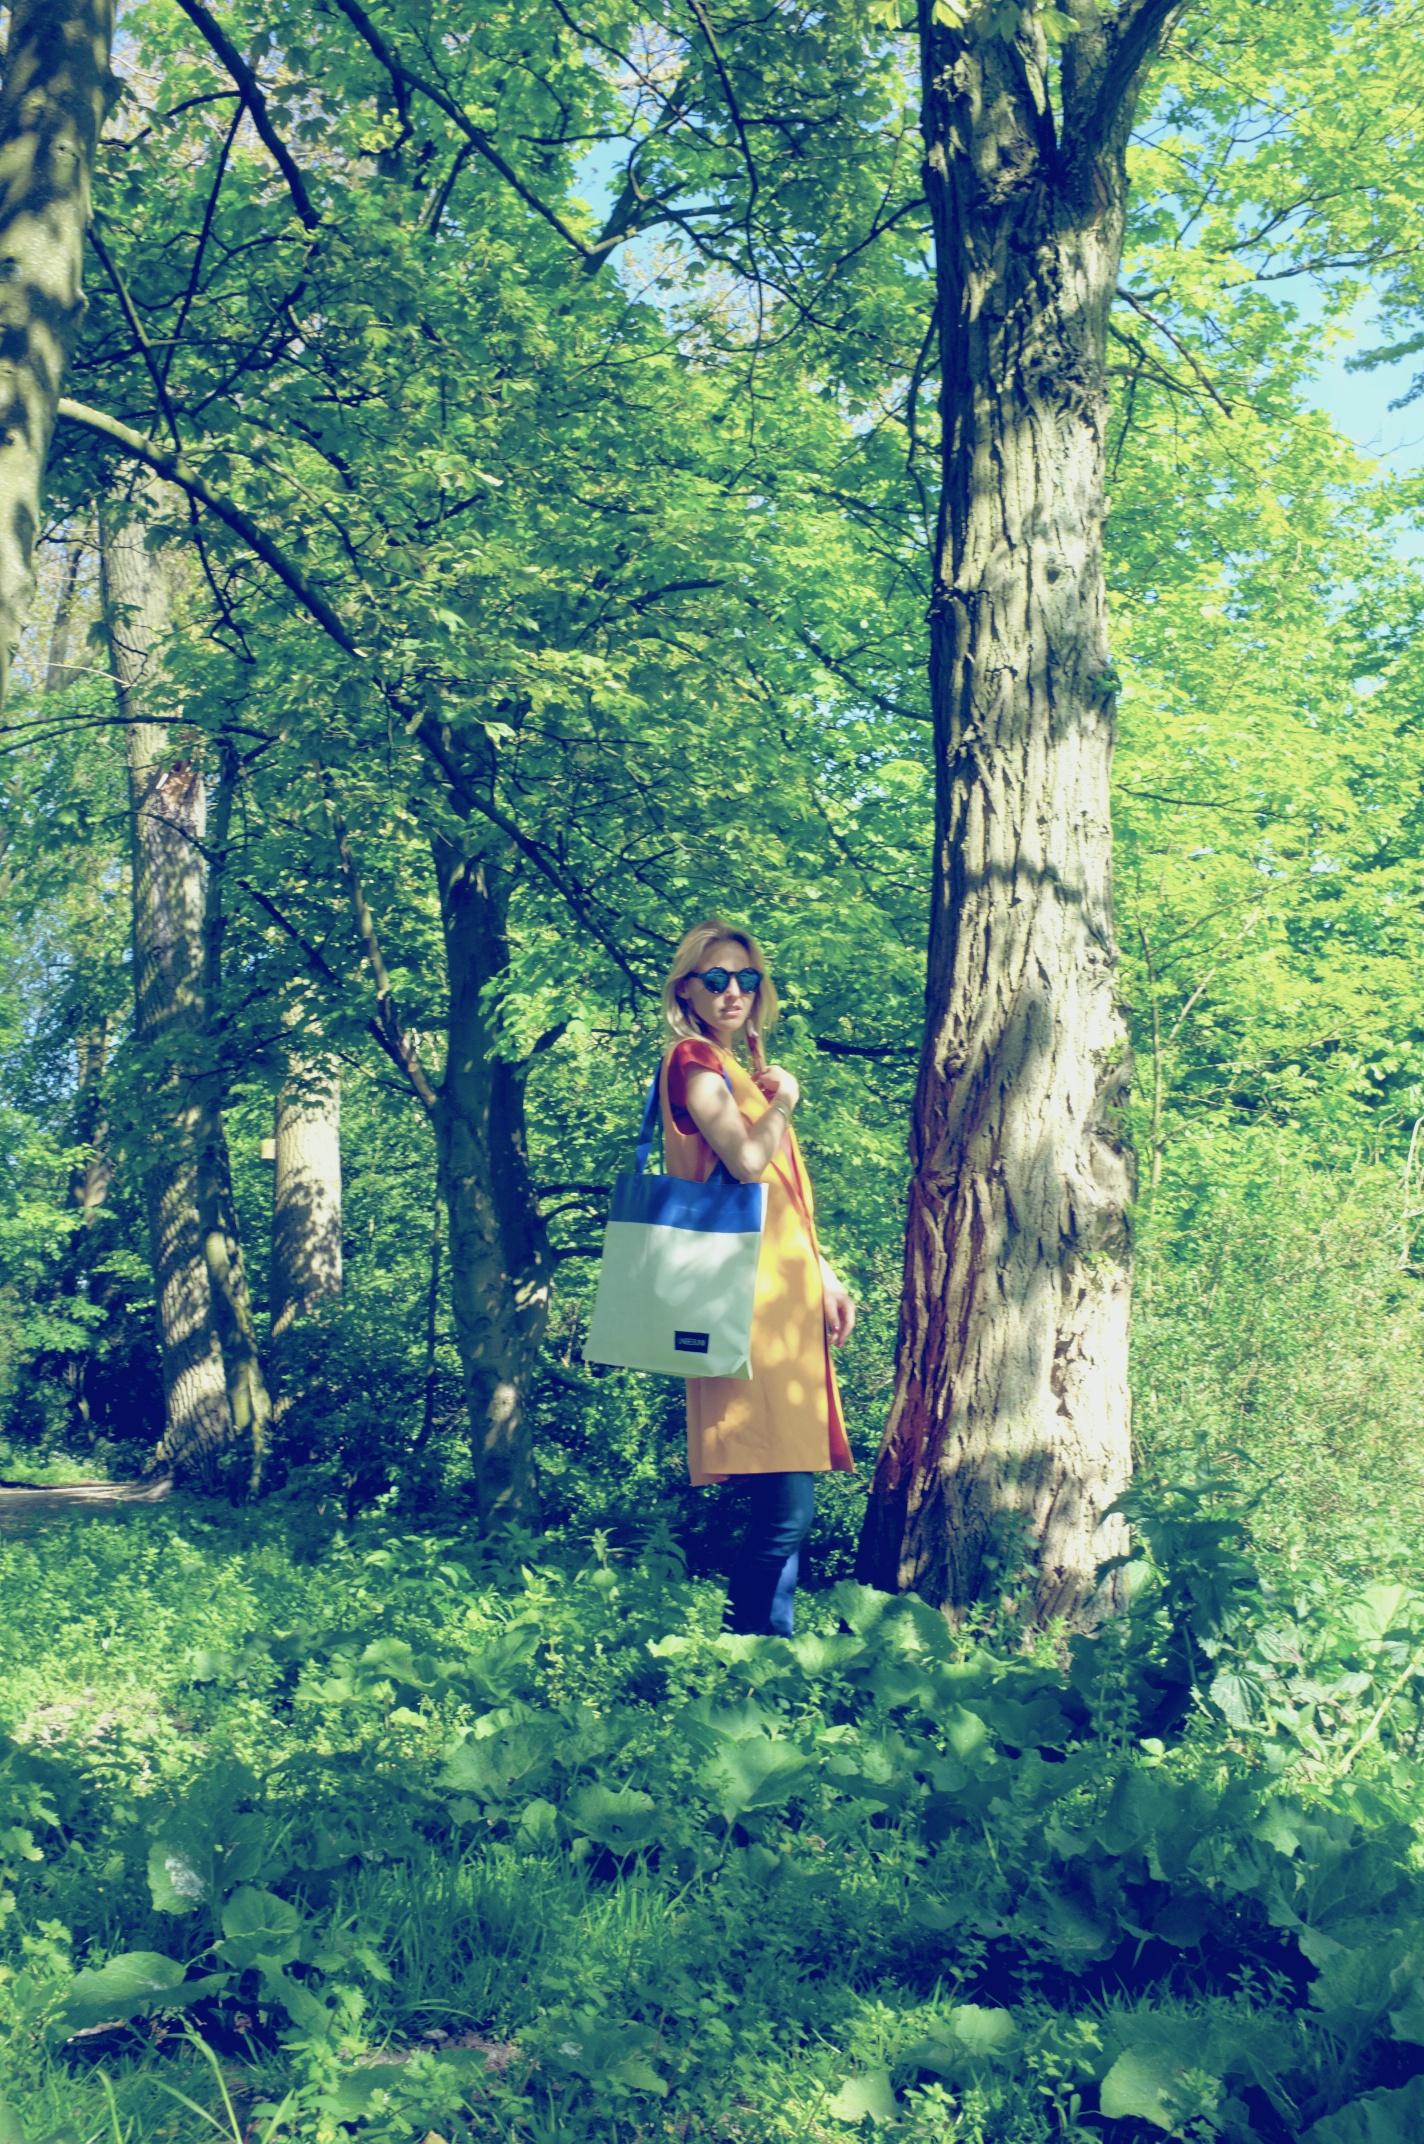 BagAtYou - Fashion Blog - Unbegun Bags - Tassen 6 - Summer